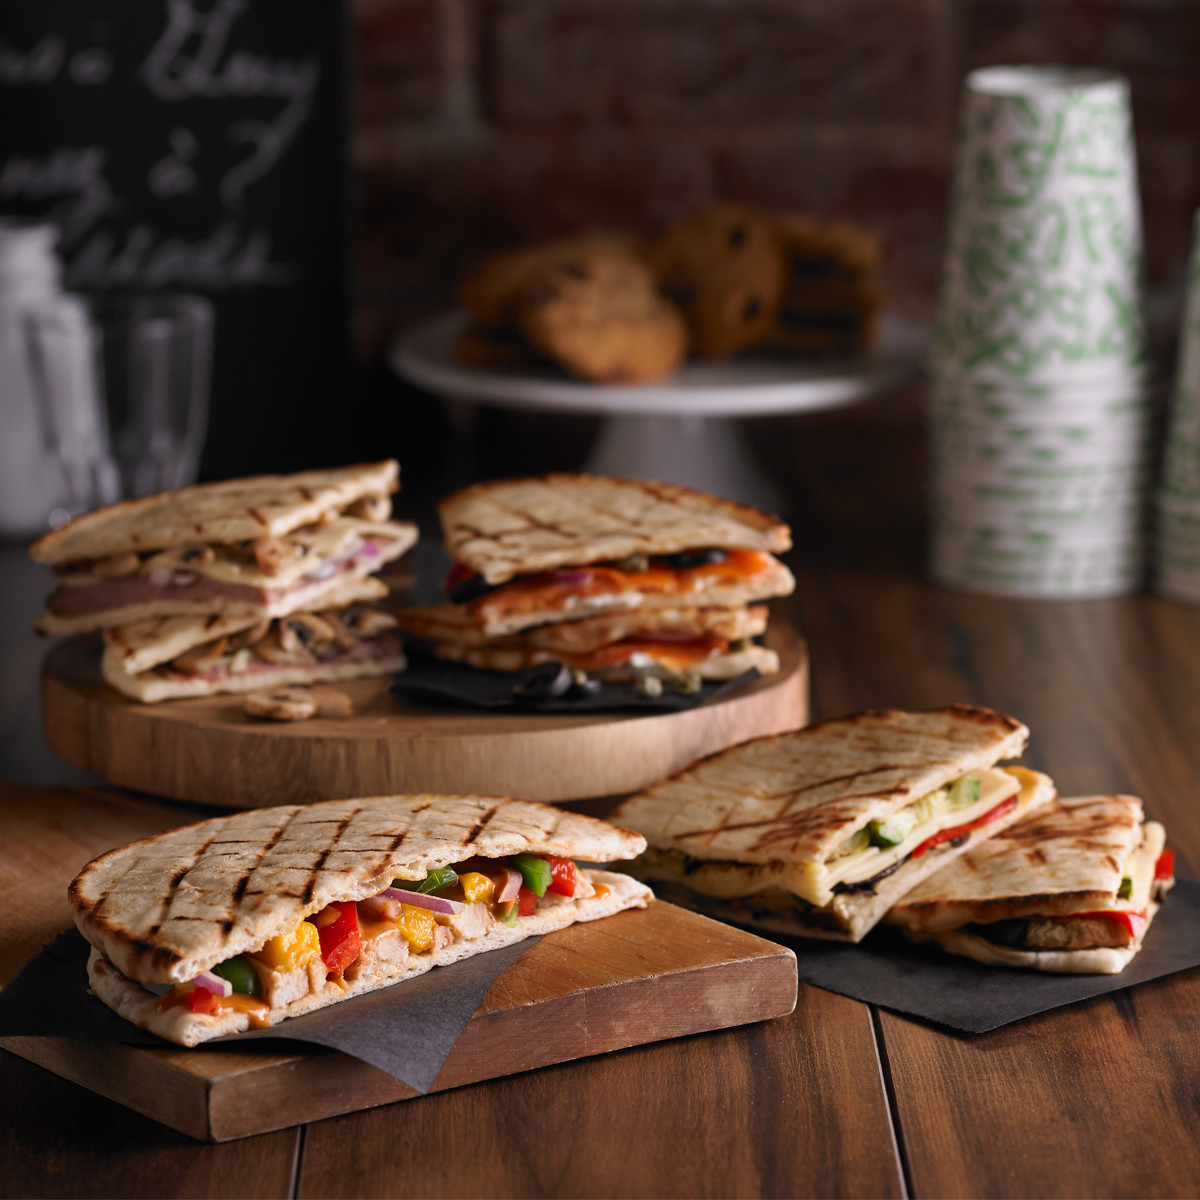 Sandwichs au pain pita assortis